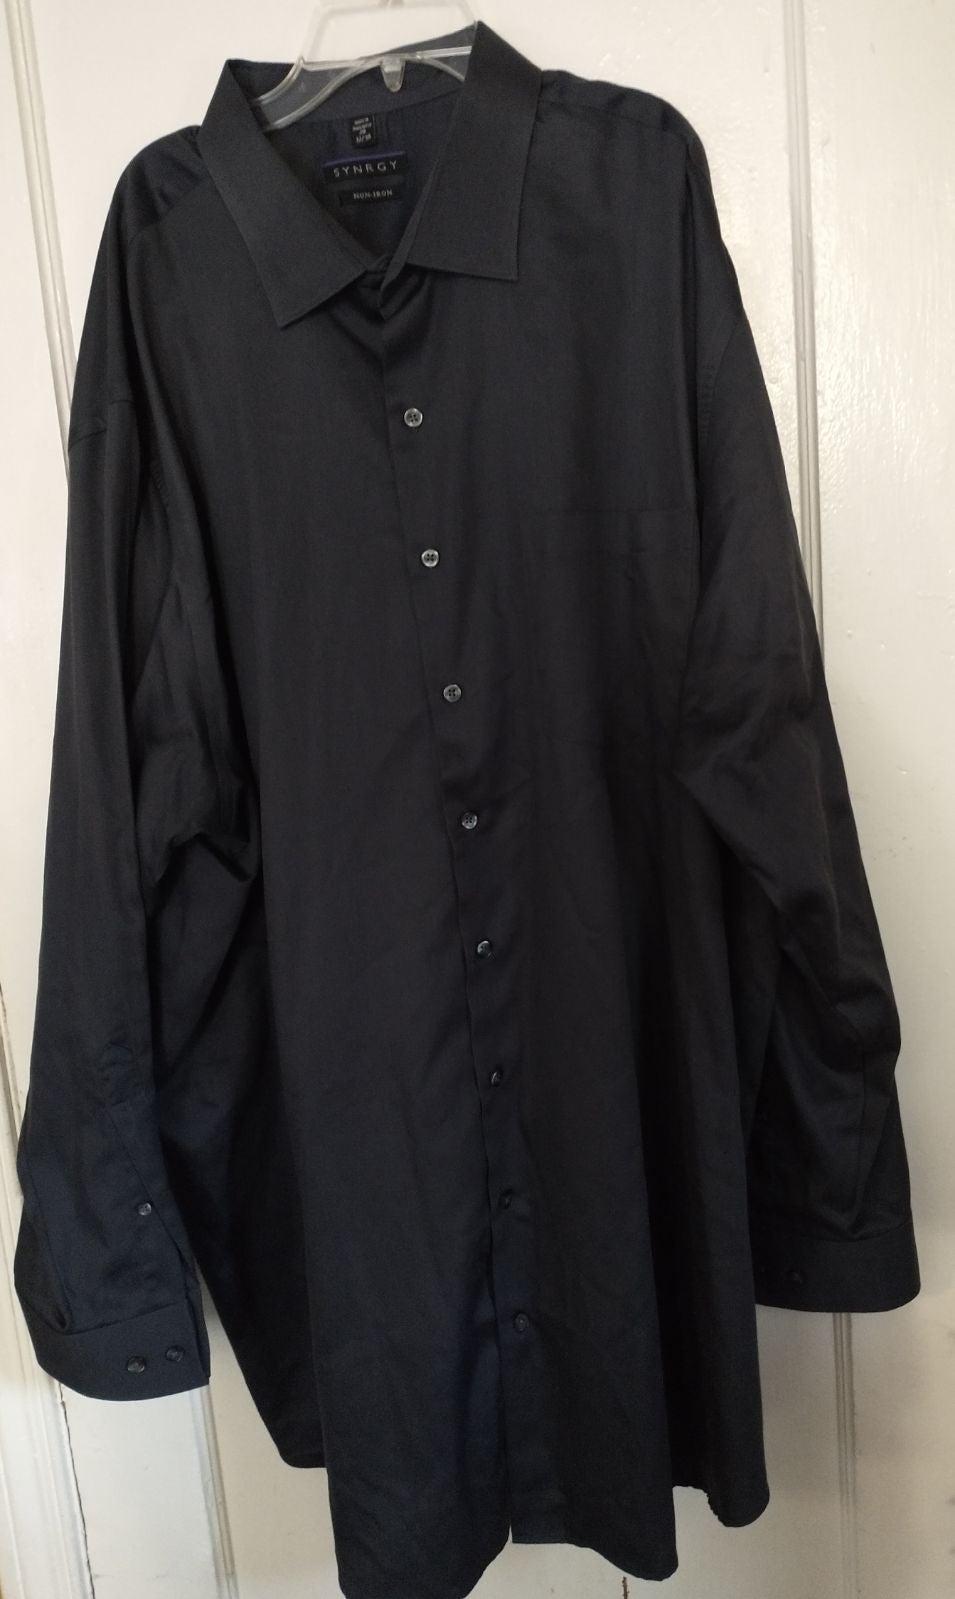 Synergy Charcoal Long Sleeve Shirt 37/38